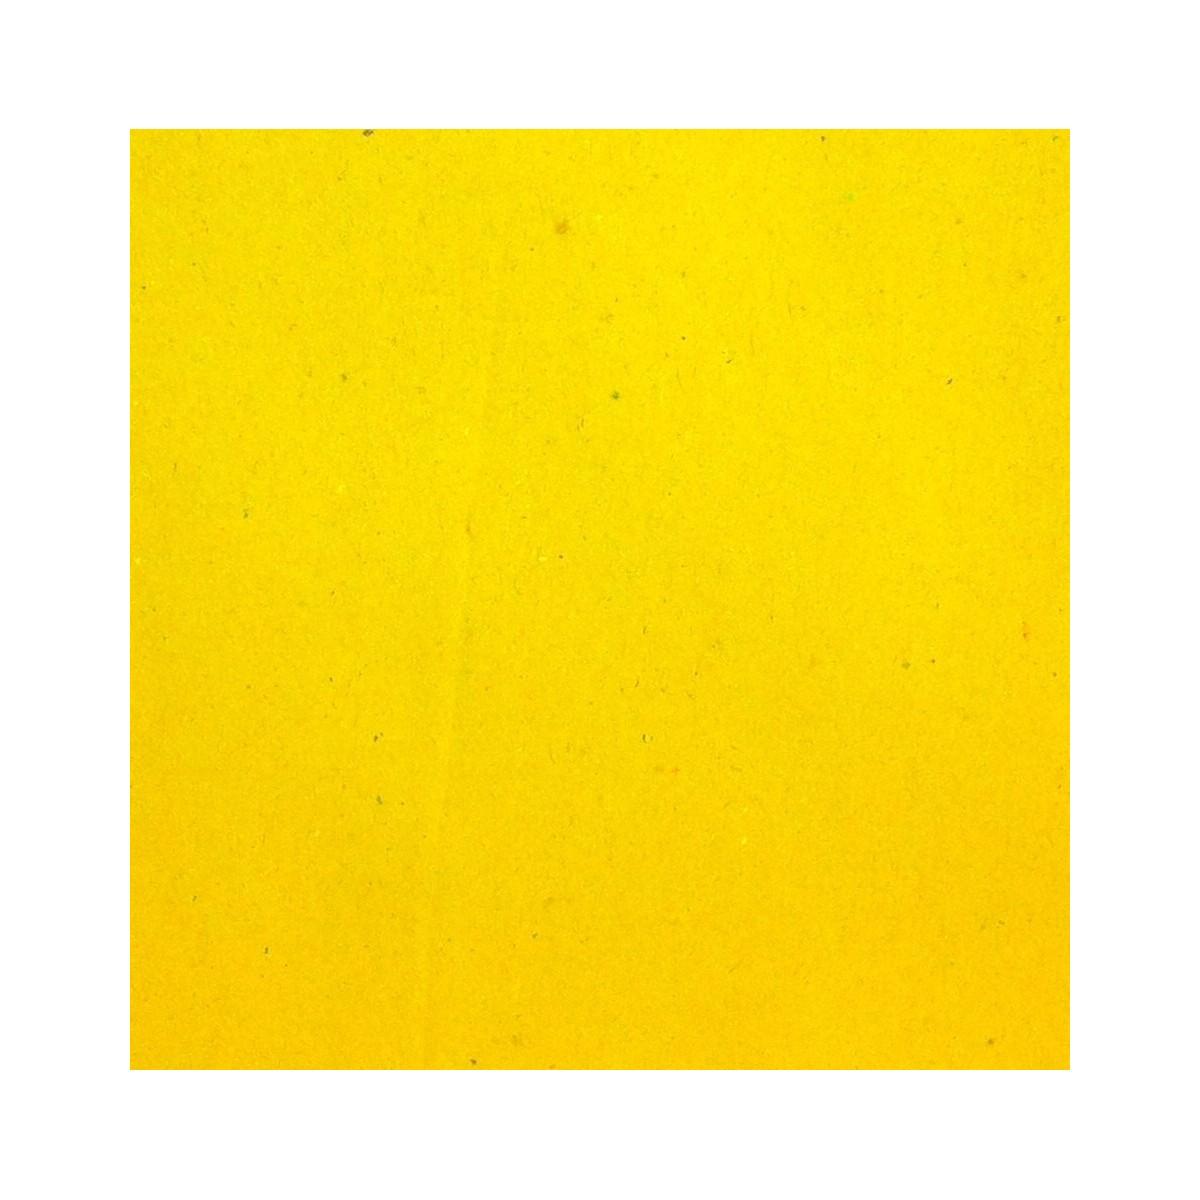 1 Kg. Carta Paglia ECOCHIC Gr.80 Fogli Cm.70x100 Tinta Unita